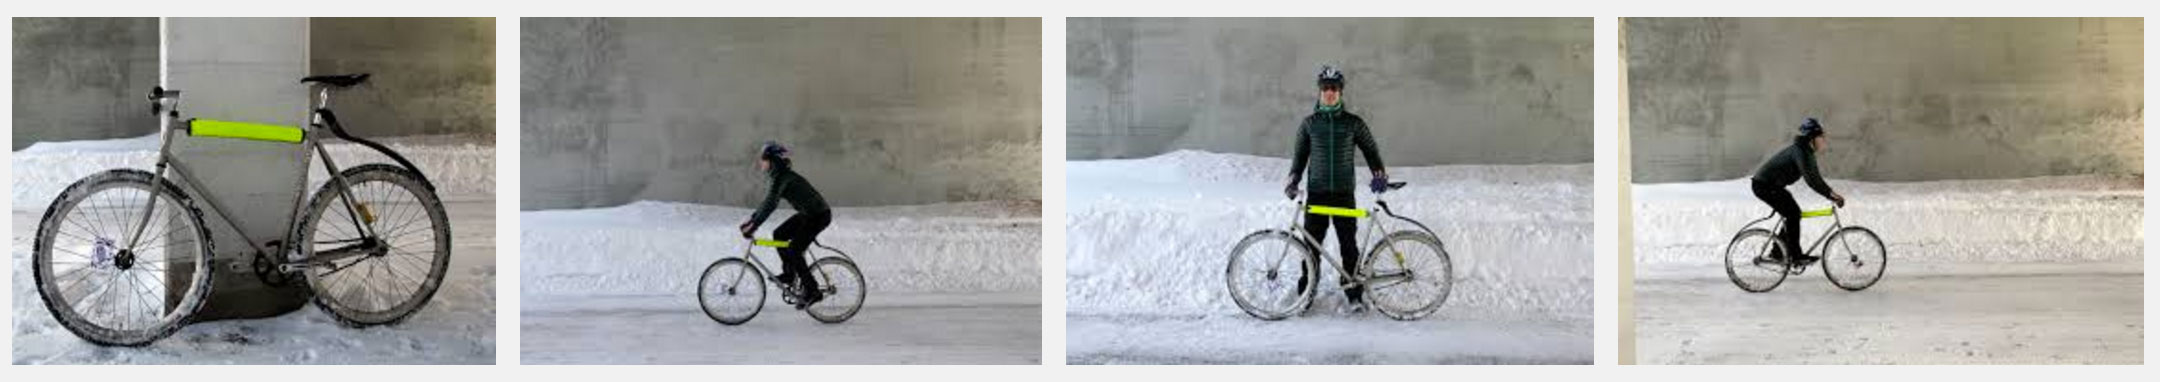 winter-biking-2